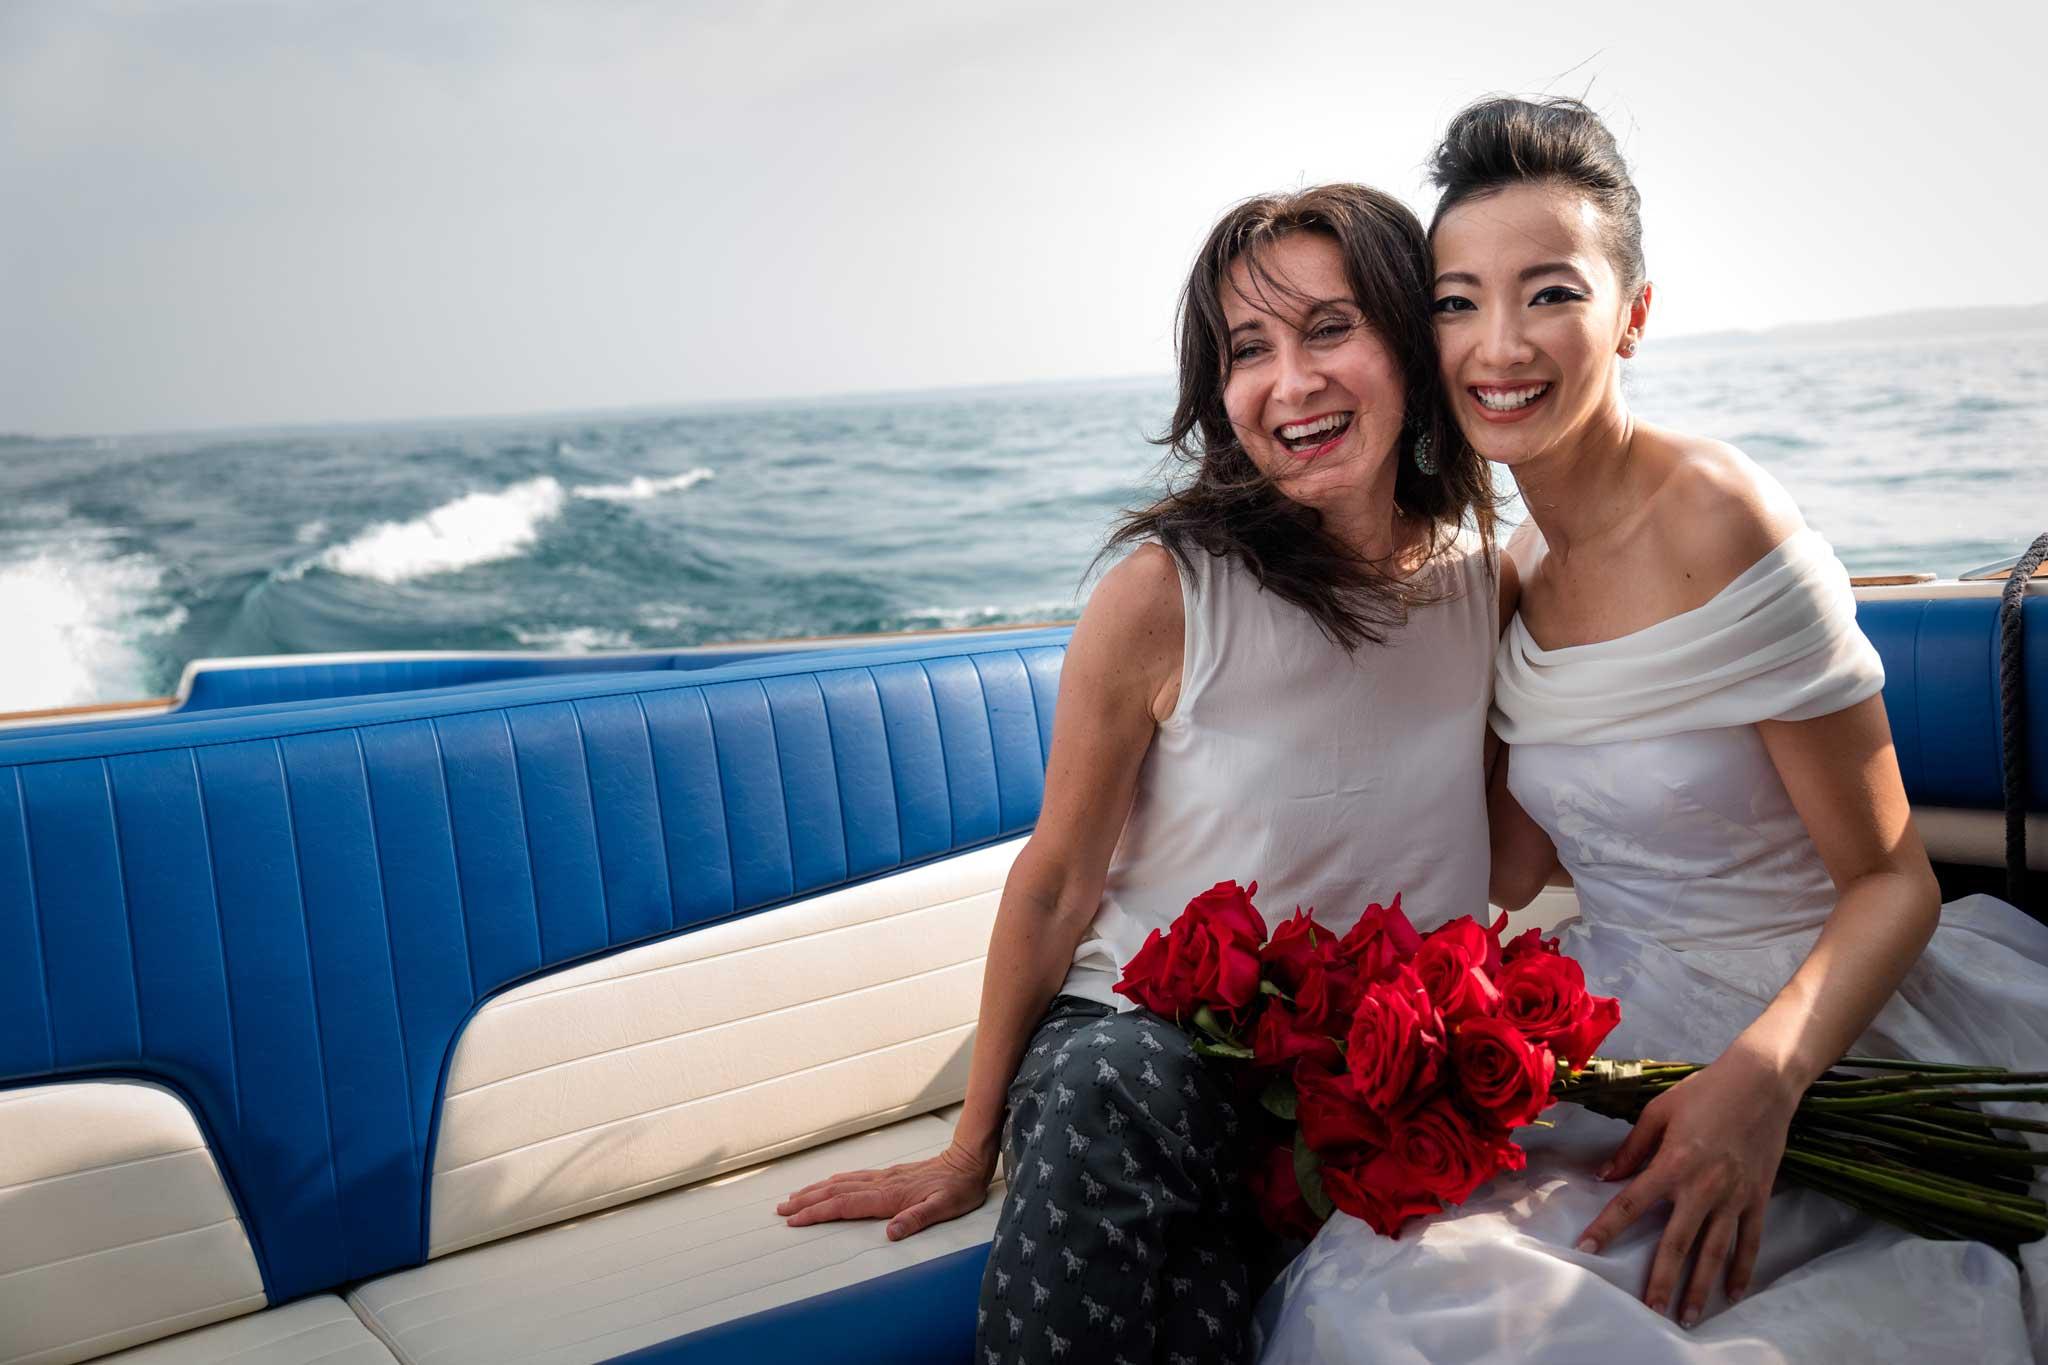 intervista ad alessia santa wedding planner destination wedding